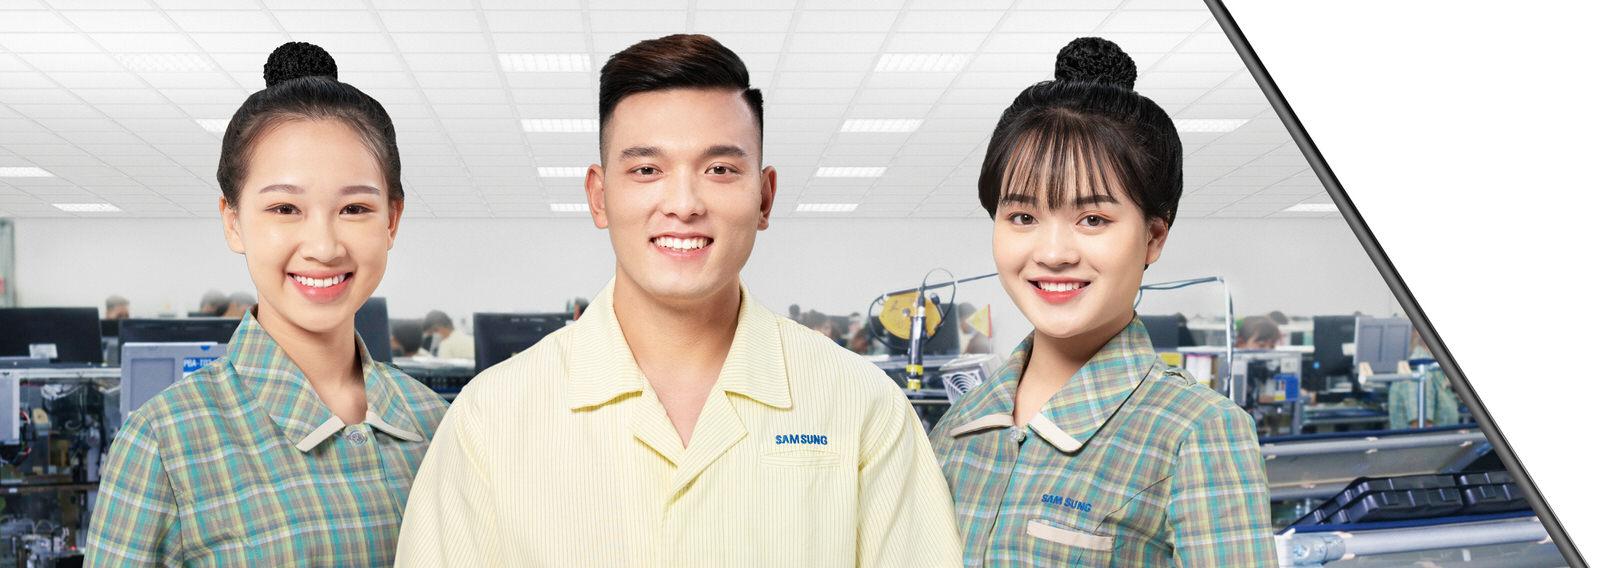 Portrait of Samsung's workers